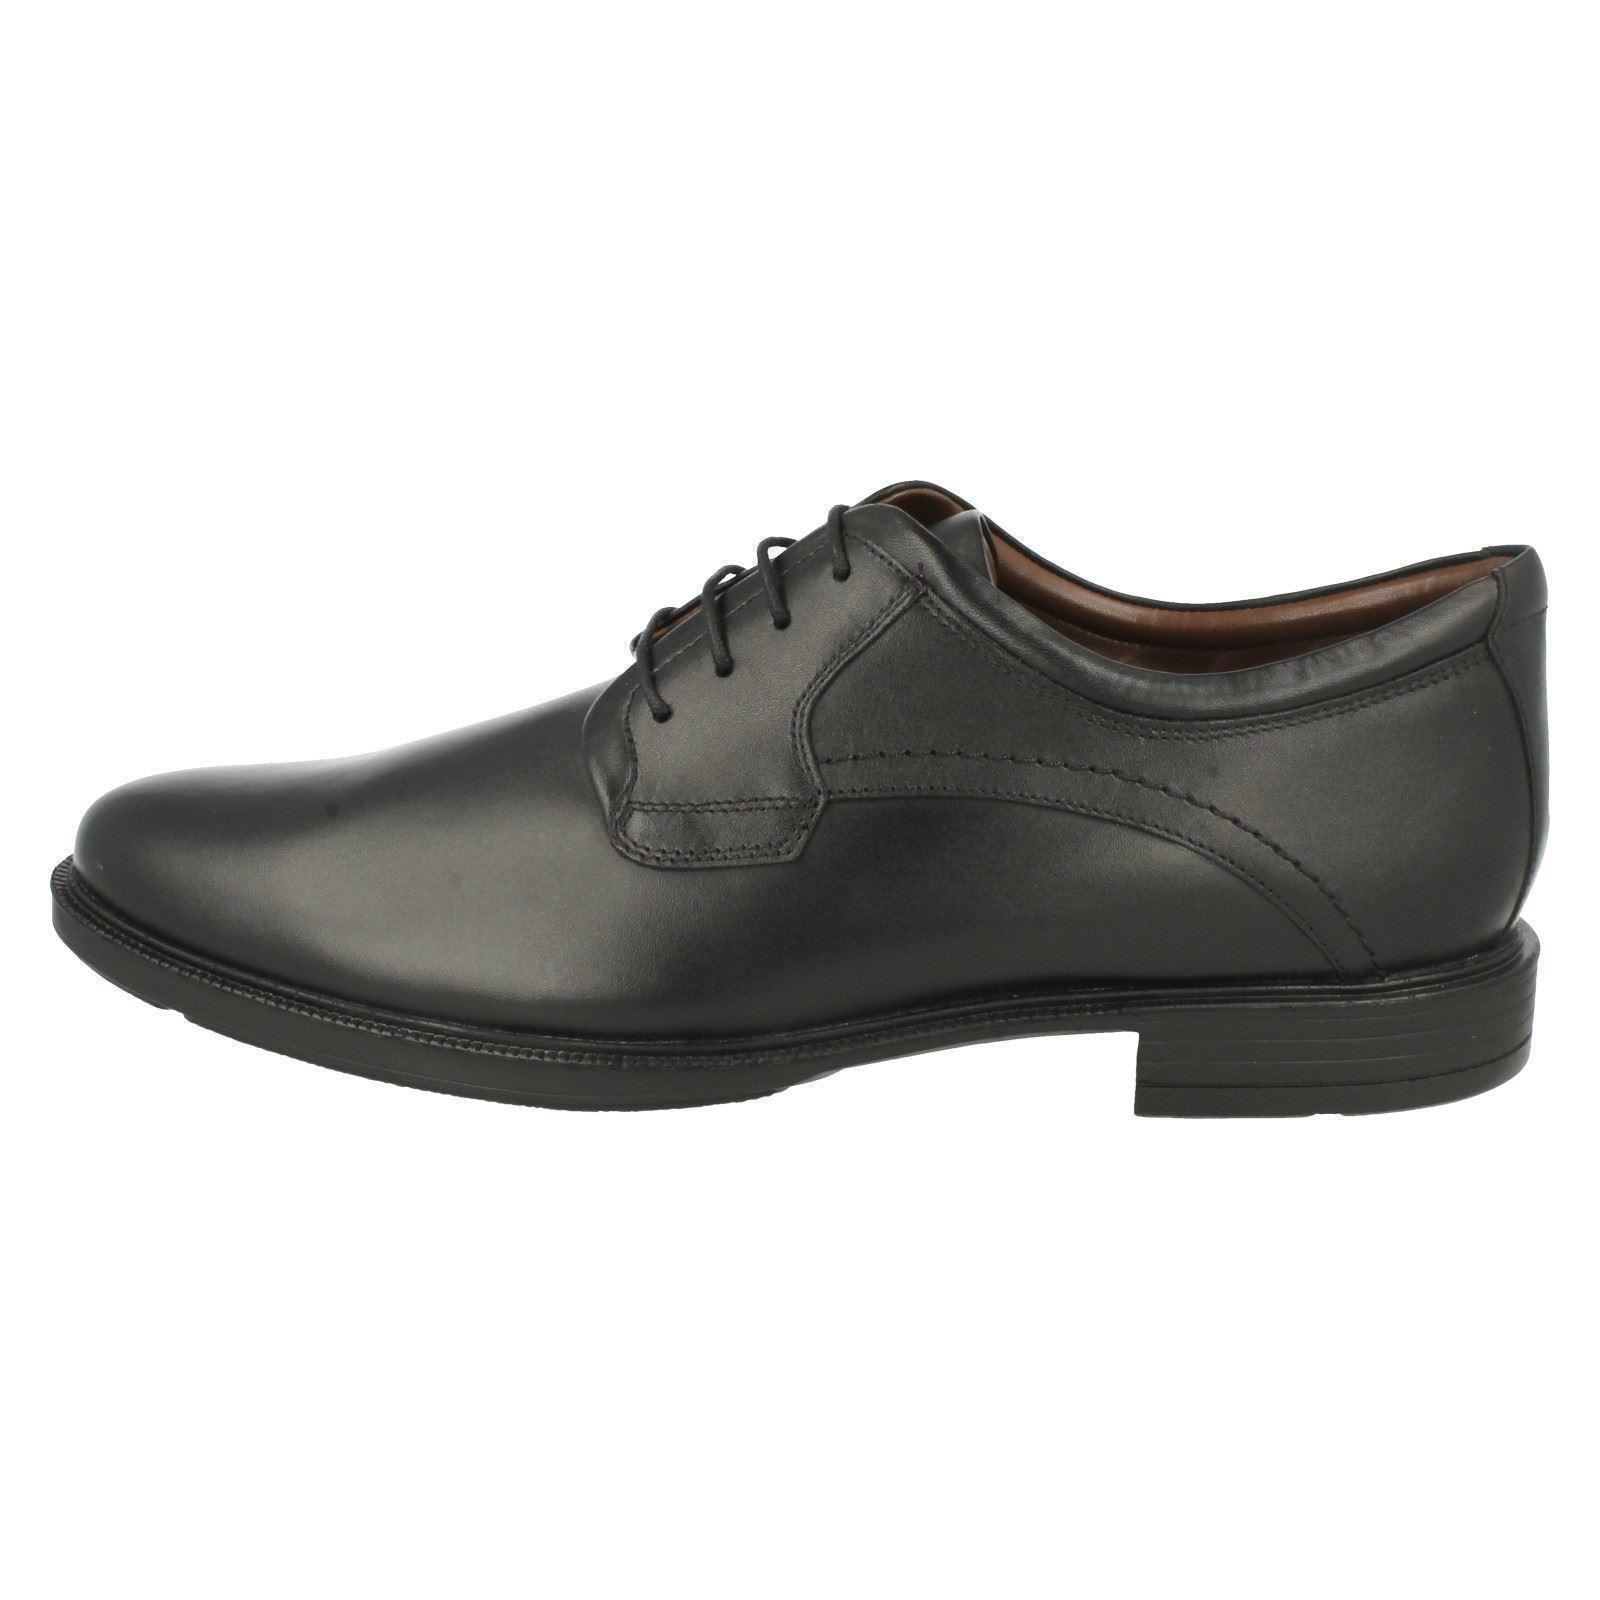 Noir Hommes Chaussures Hush Michigan Puppies 3 qxzpFU